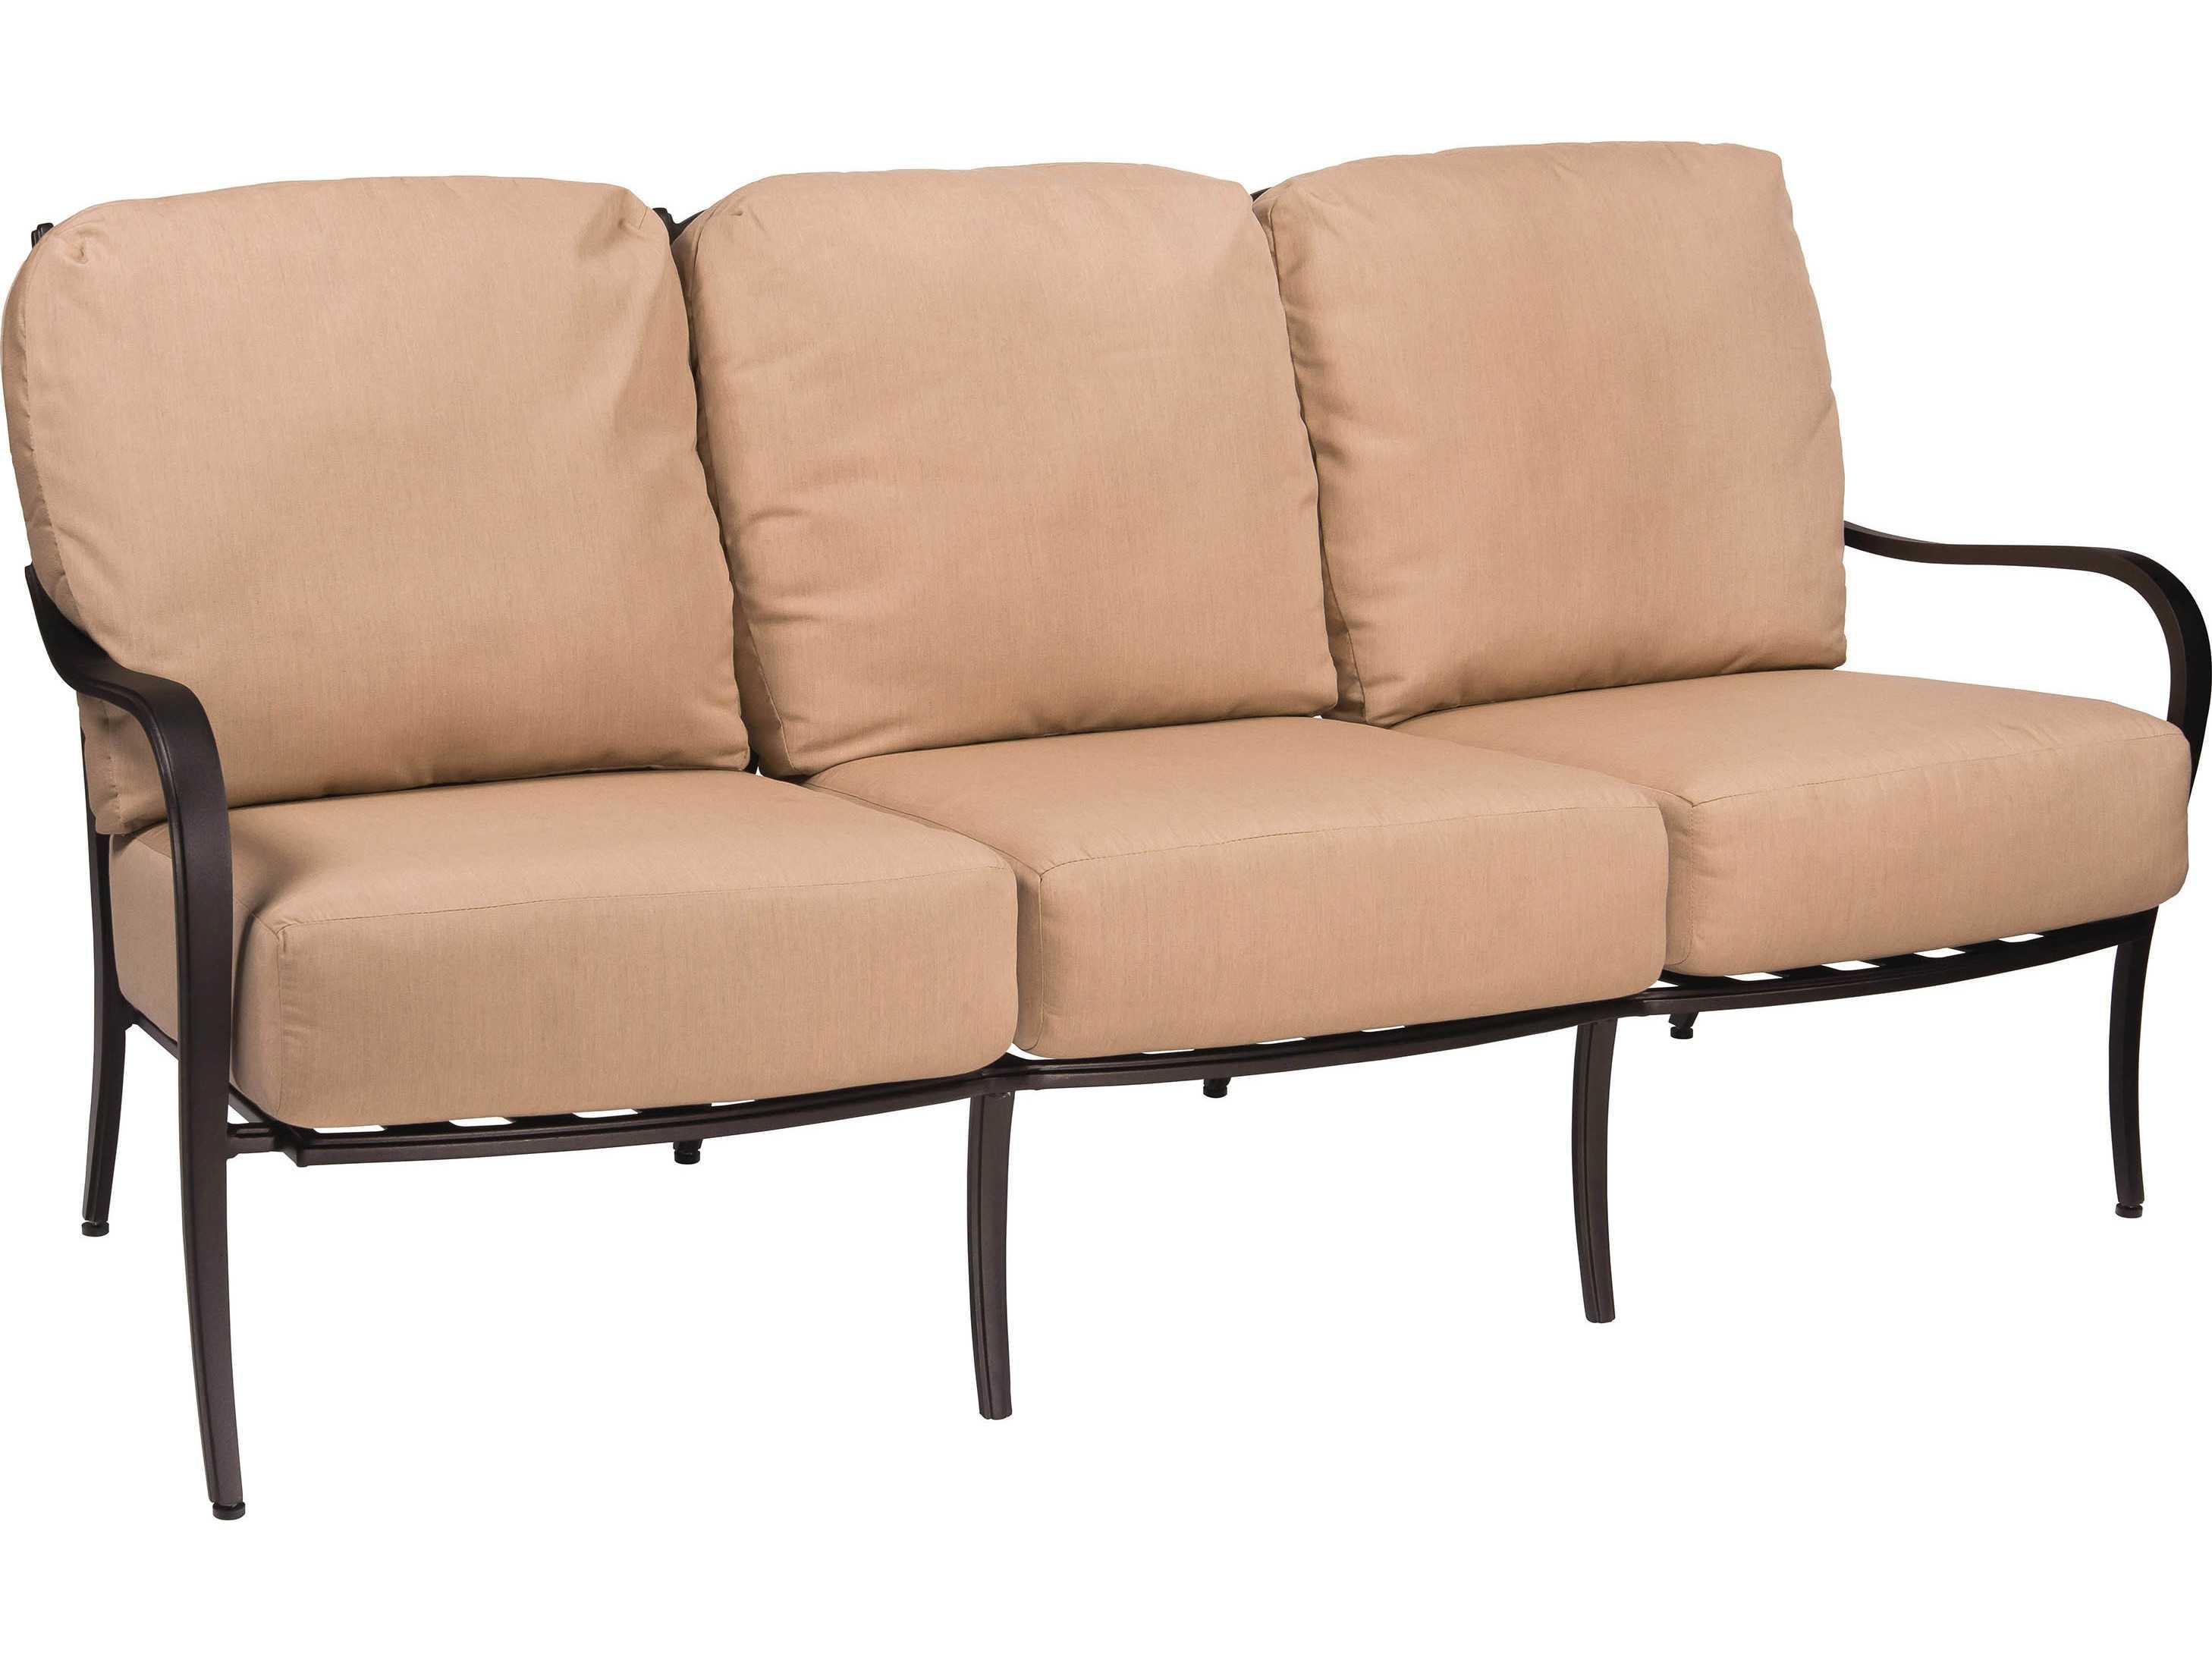 woodard apollo aluminum lounge set apollolngset. Black Bedroom Furniture Sets. Home Design Ideas